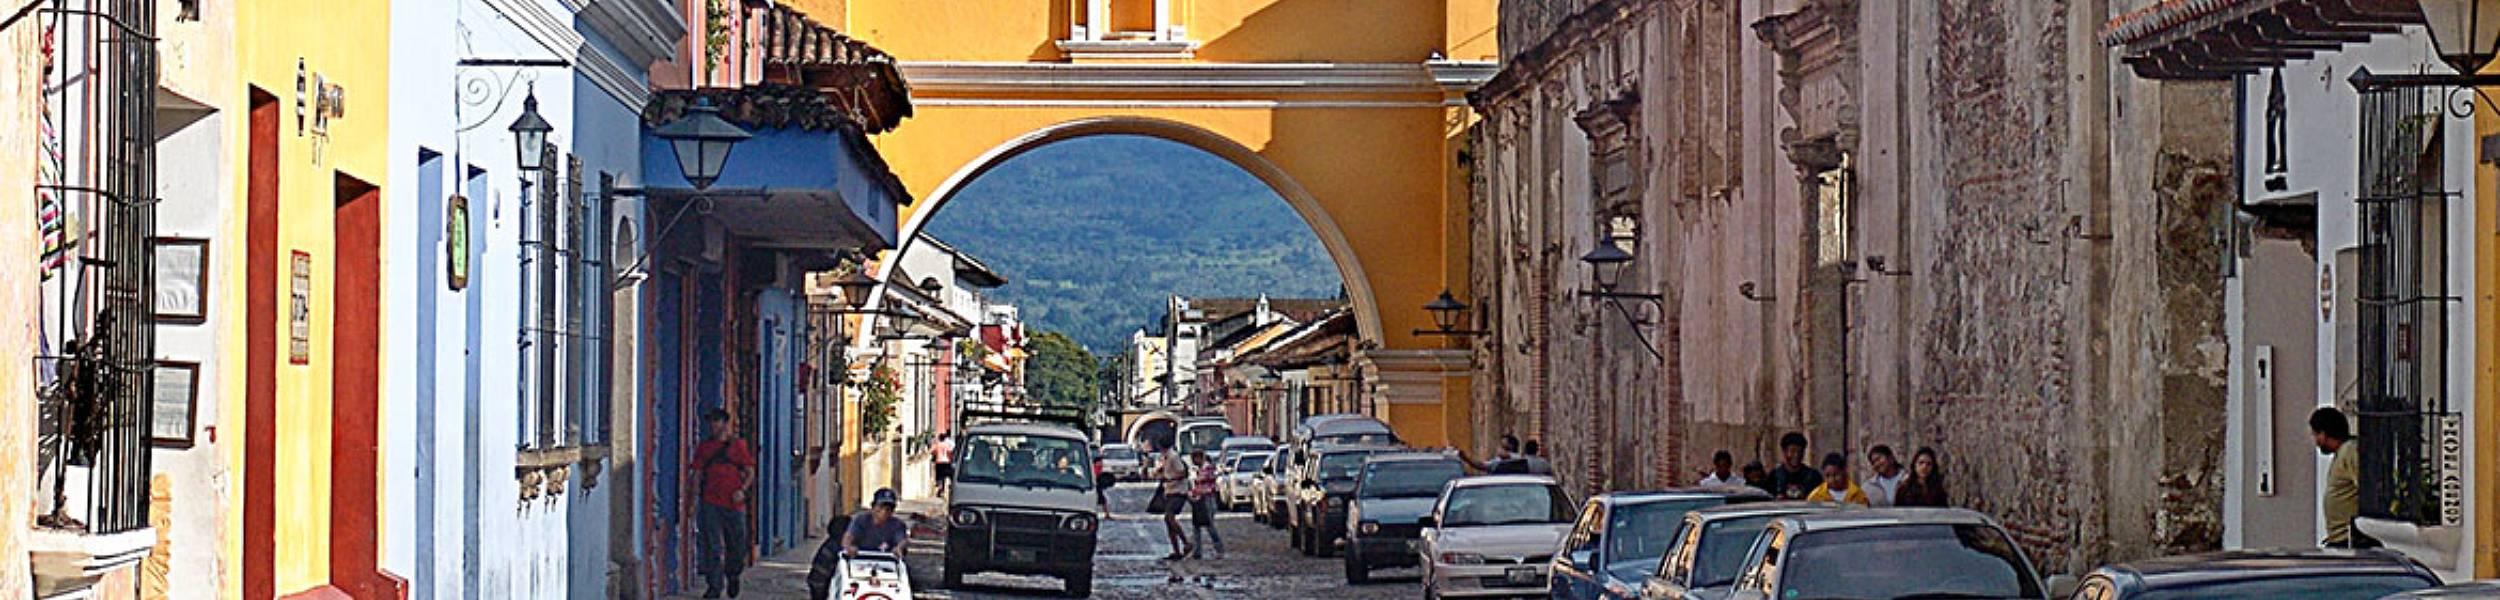 Antigua-Guatemala-Santa-Catalina-Arch (1)